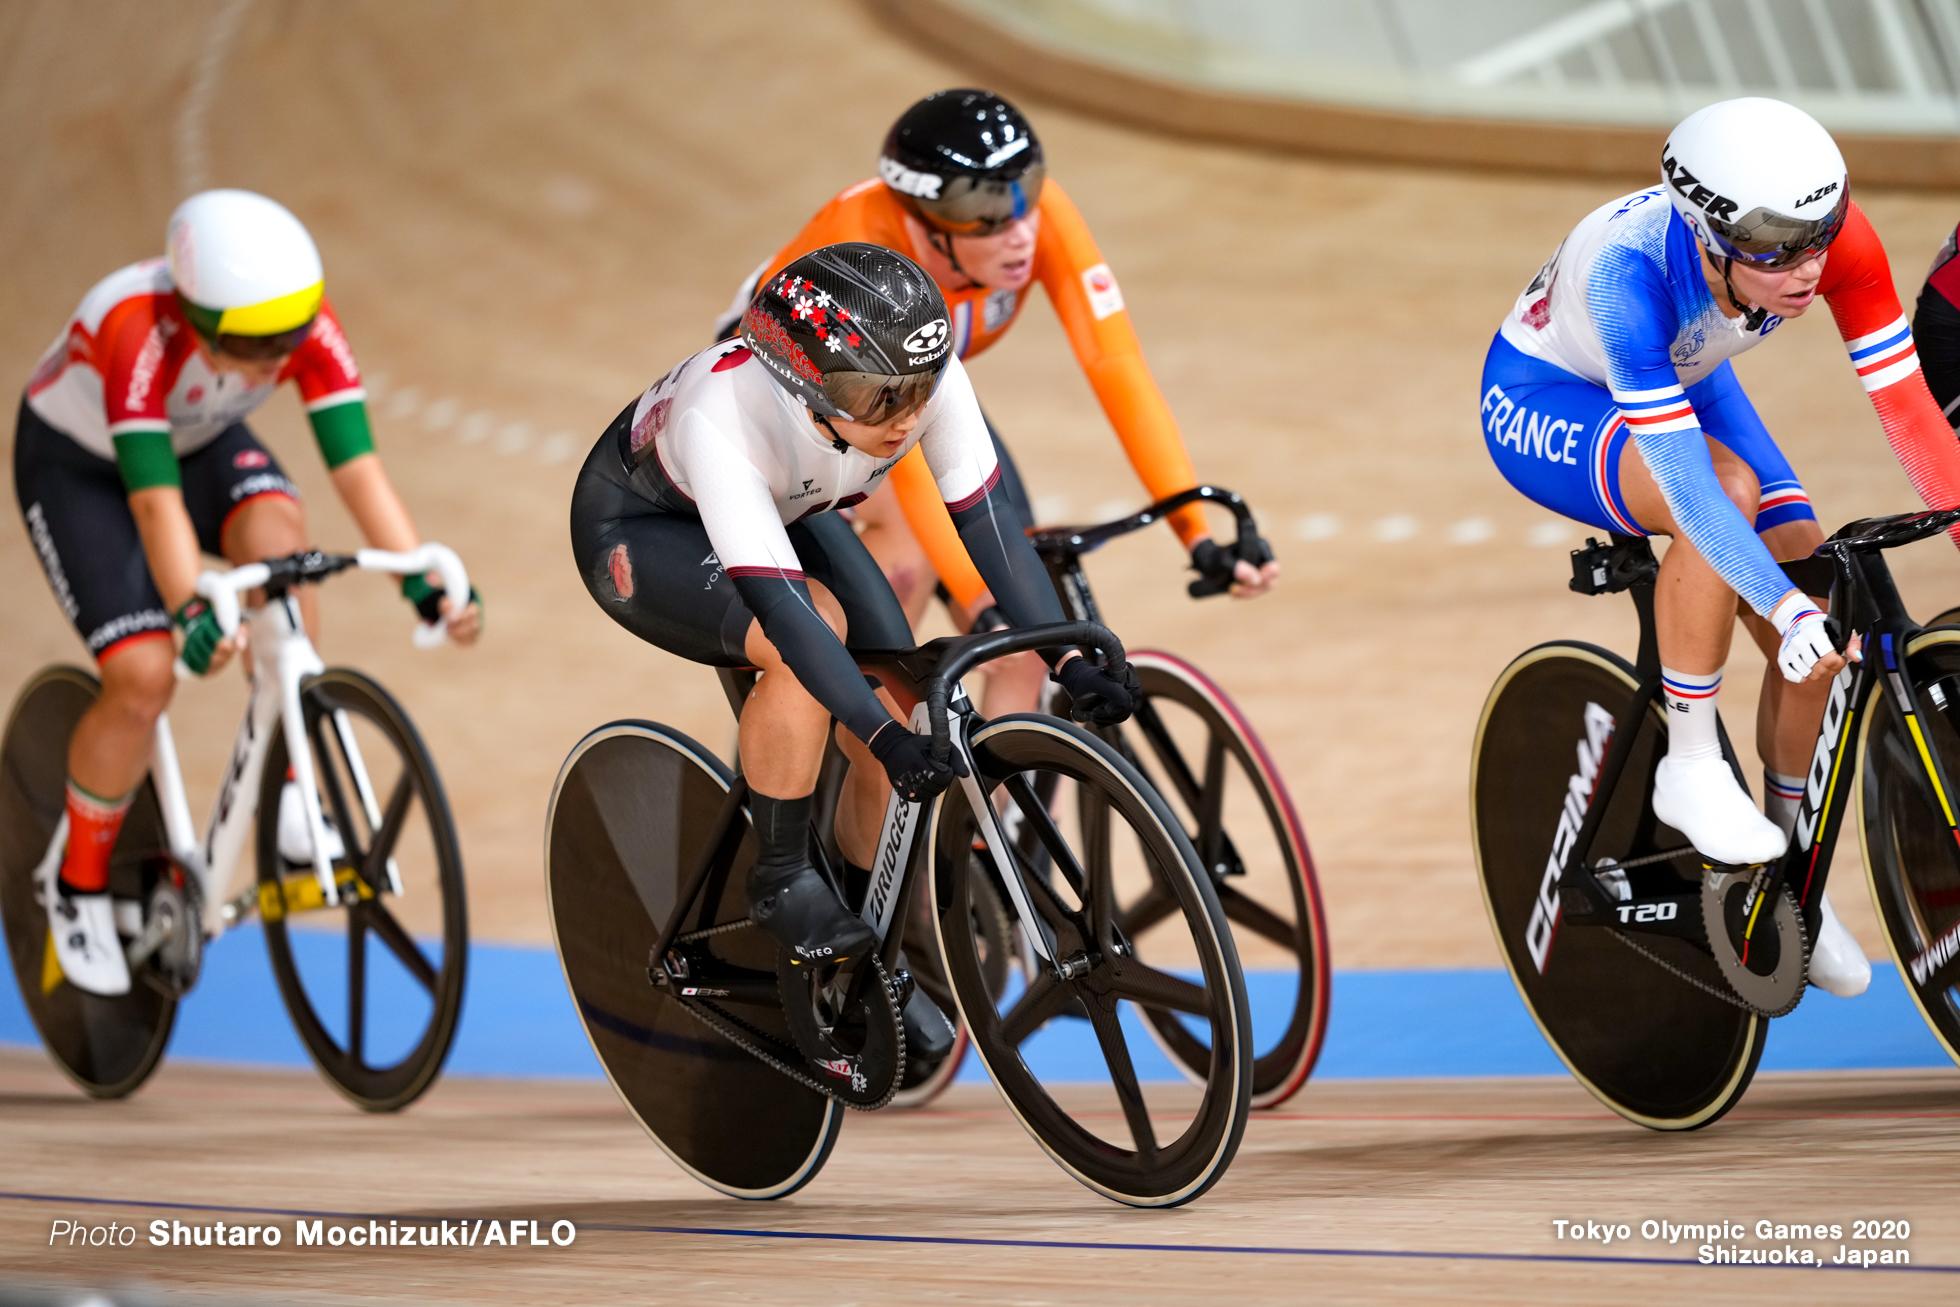 Women's Omnium Points Race 4/4 梶原悠未 Yumi Kajihara (JPN), AUGUST 8, 2021 - Cycling : during the Tokyo 2020 Olympic Games at the Izu Velodrome in Shizuoka, Japan. (Photo by Shutaro Mochizuki/AFLO)